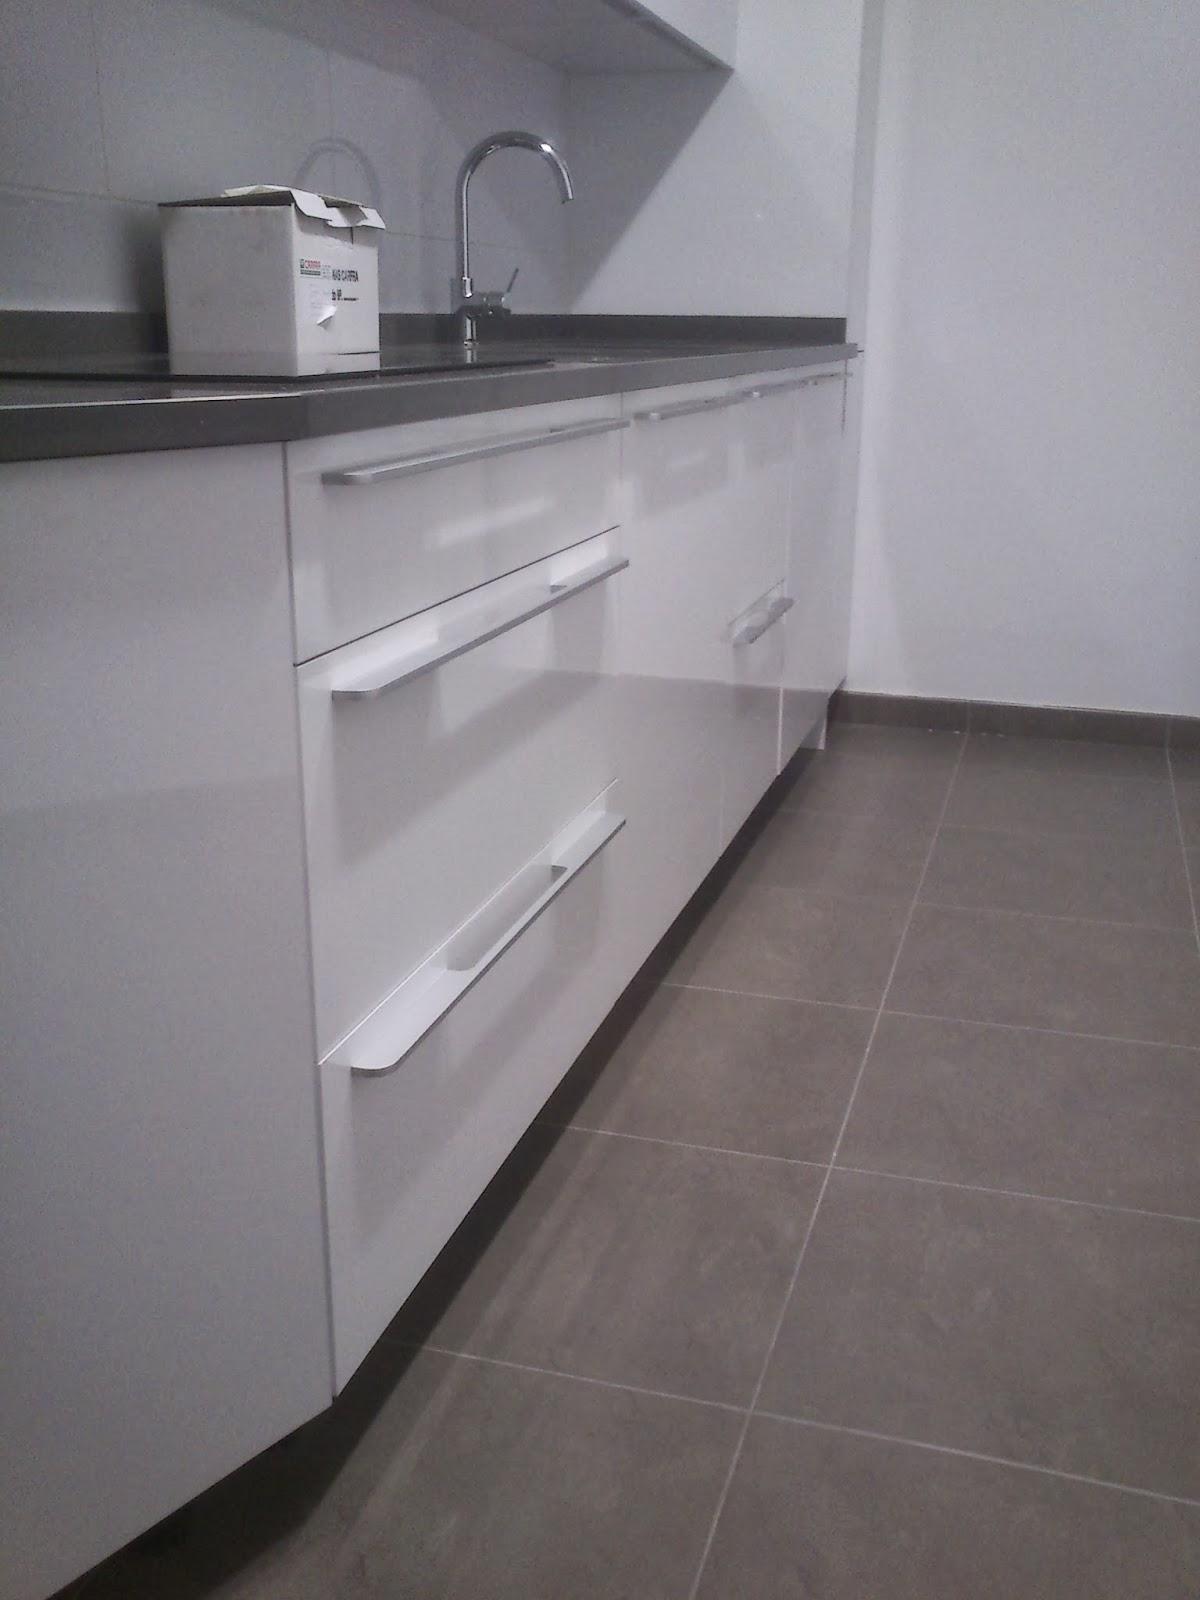 Tirador Cocina | Sergio Vivas Carpintero Colocacion De Cocina De Alta Gama En